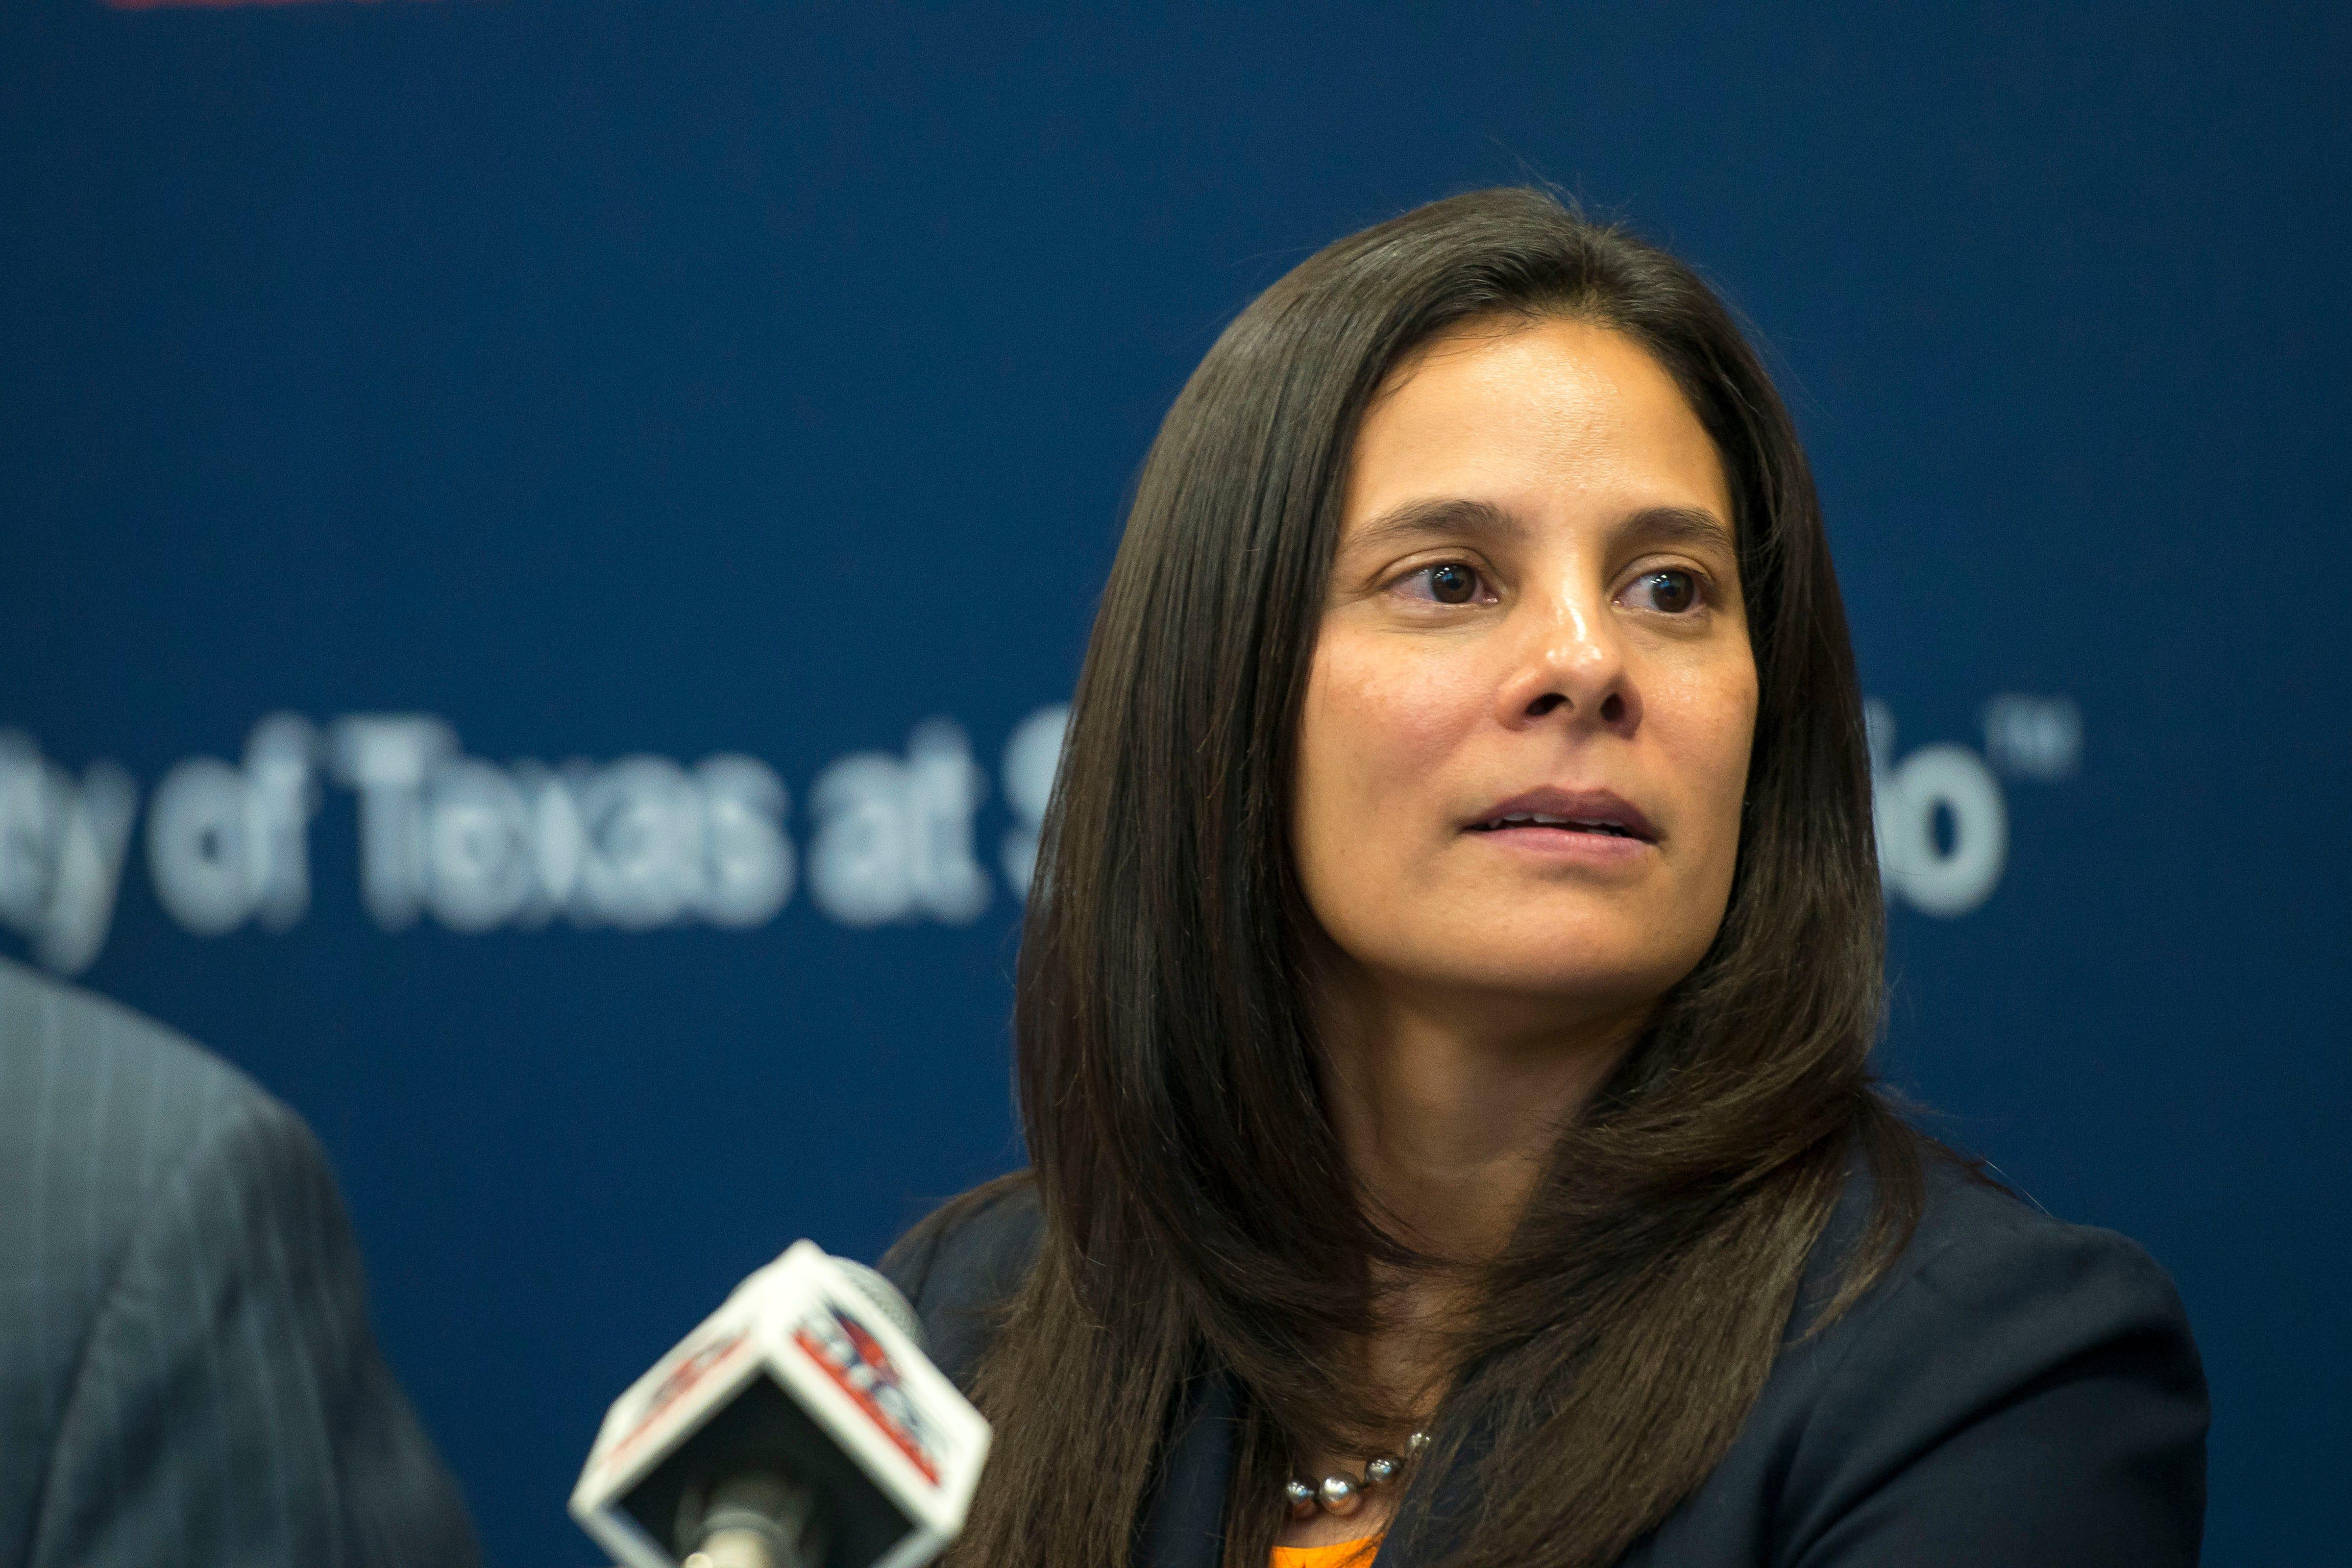 UTSA Athletic Director Lisa Campos